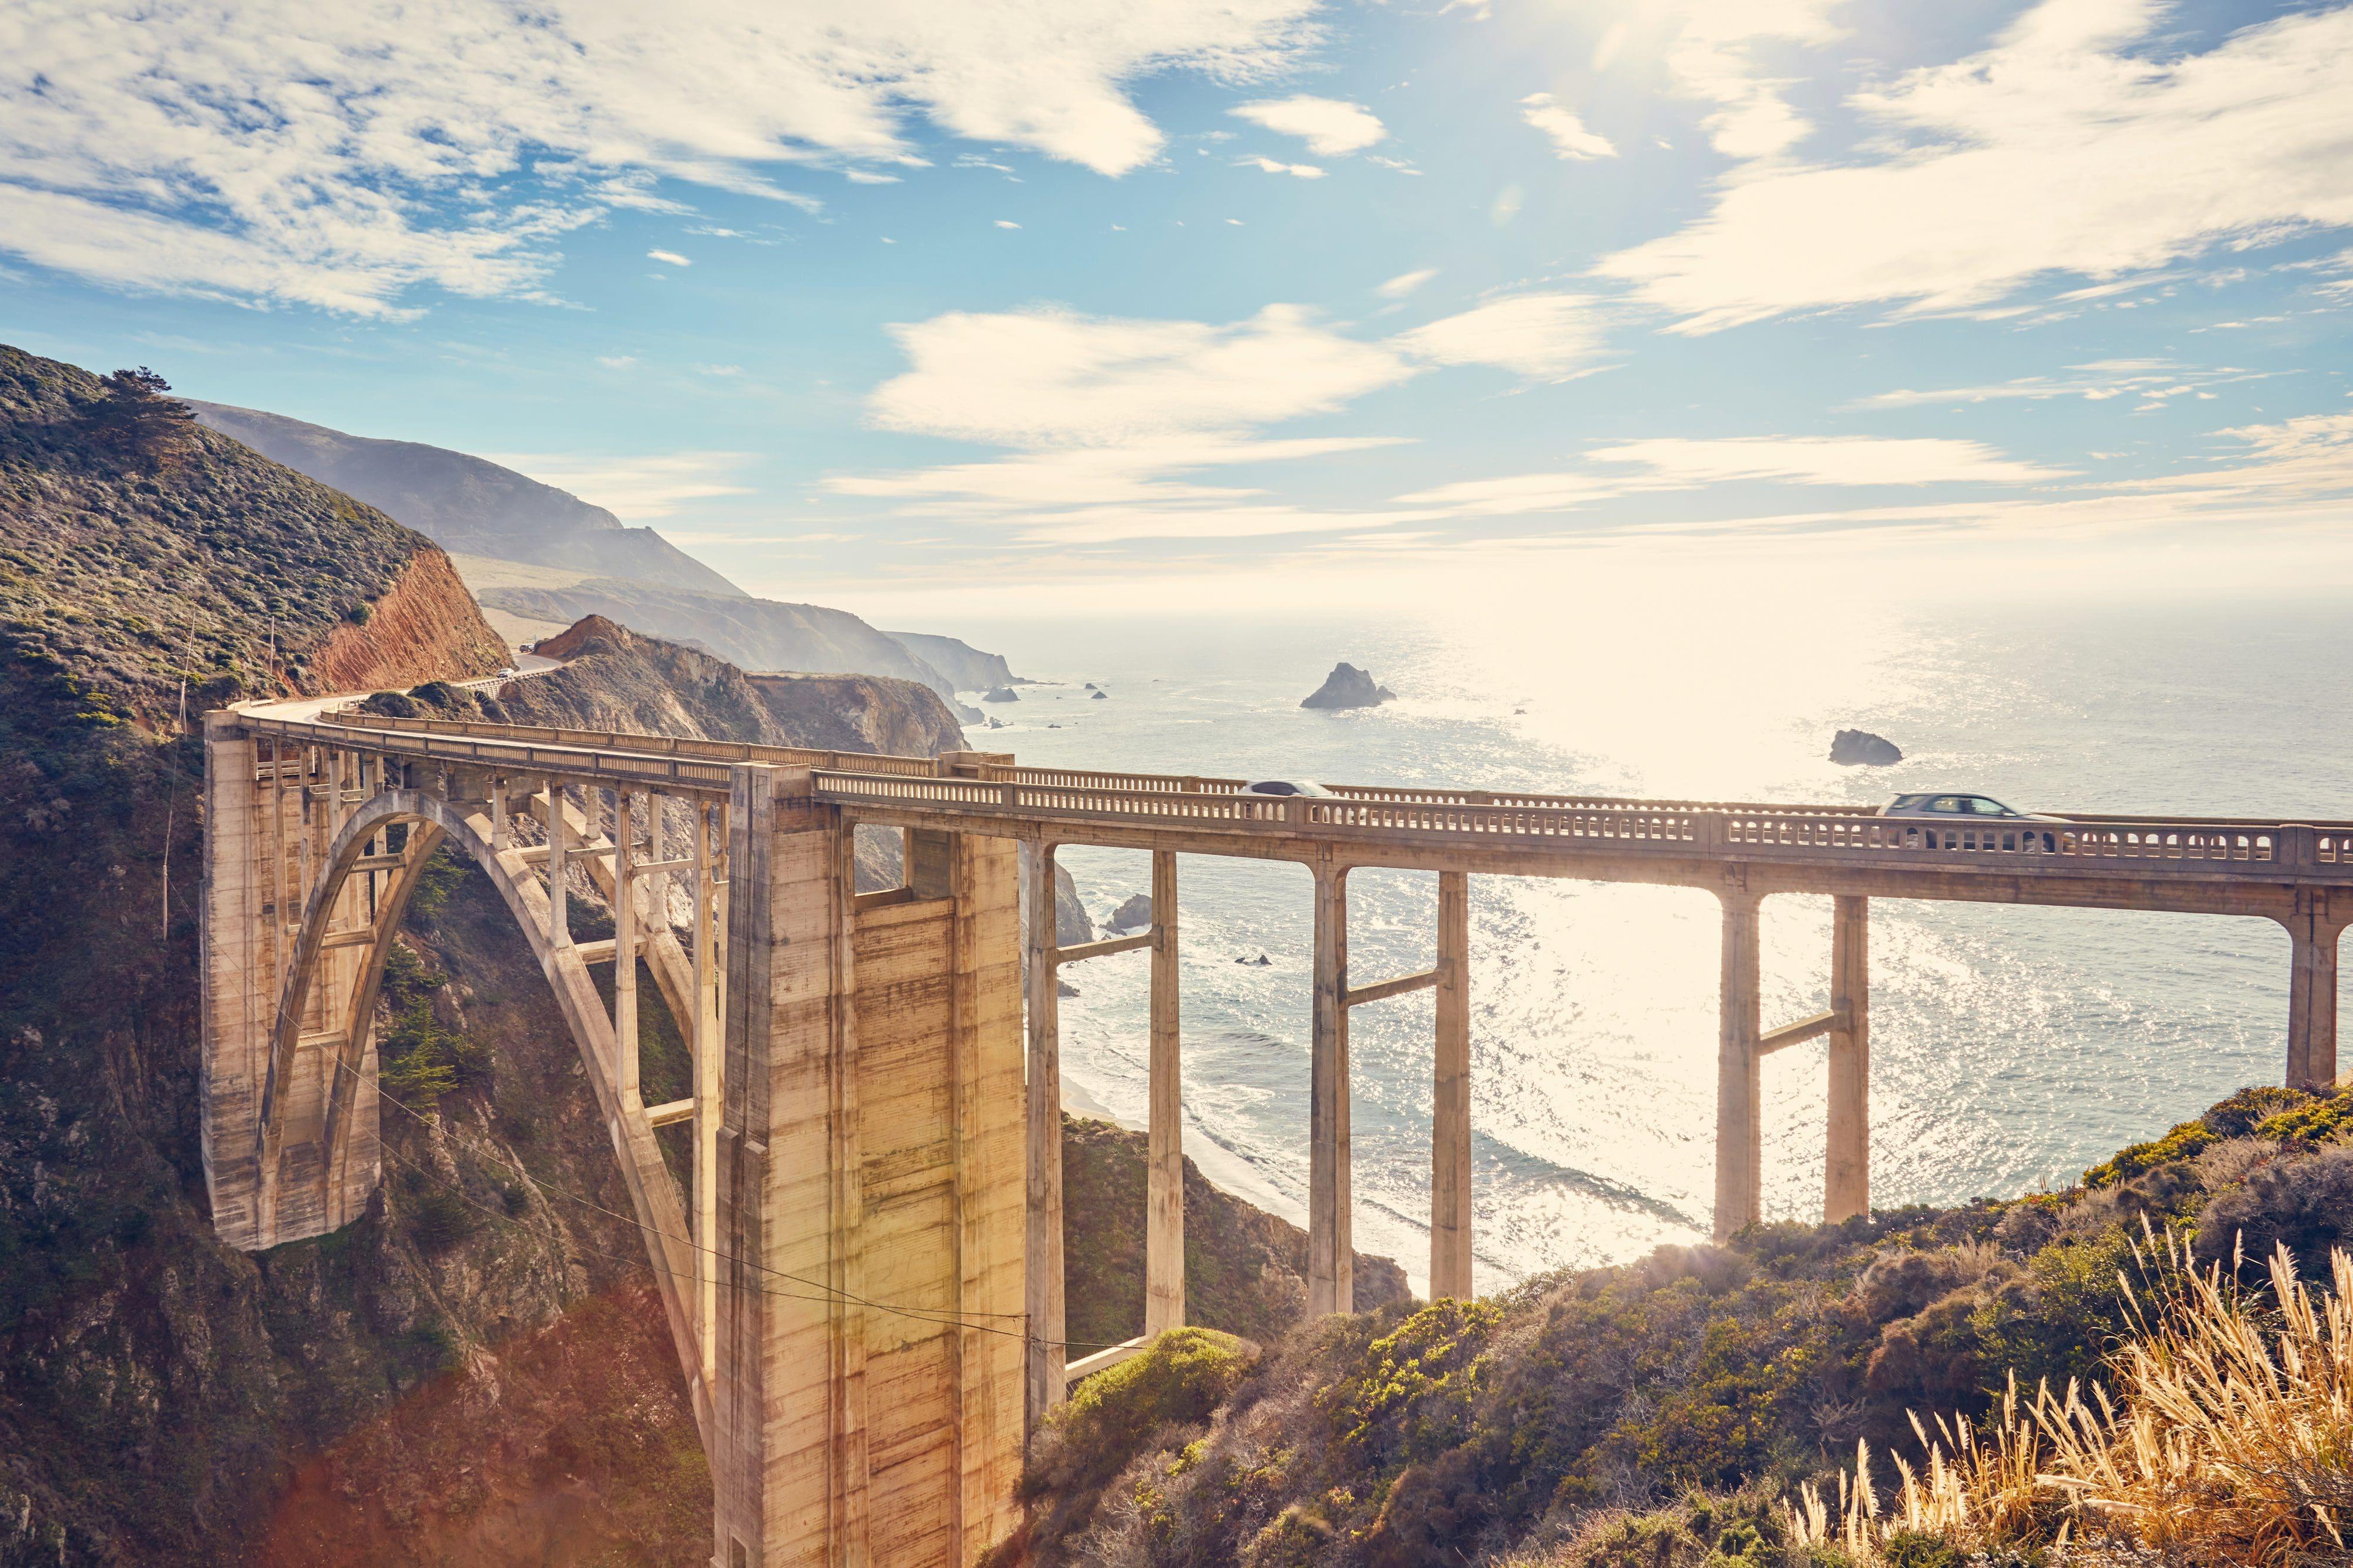 The Bixby Creek Bridge in Big Sur, California